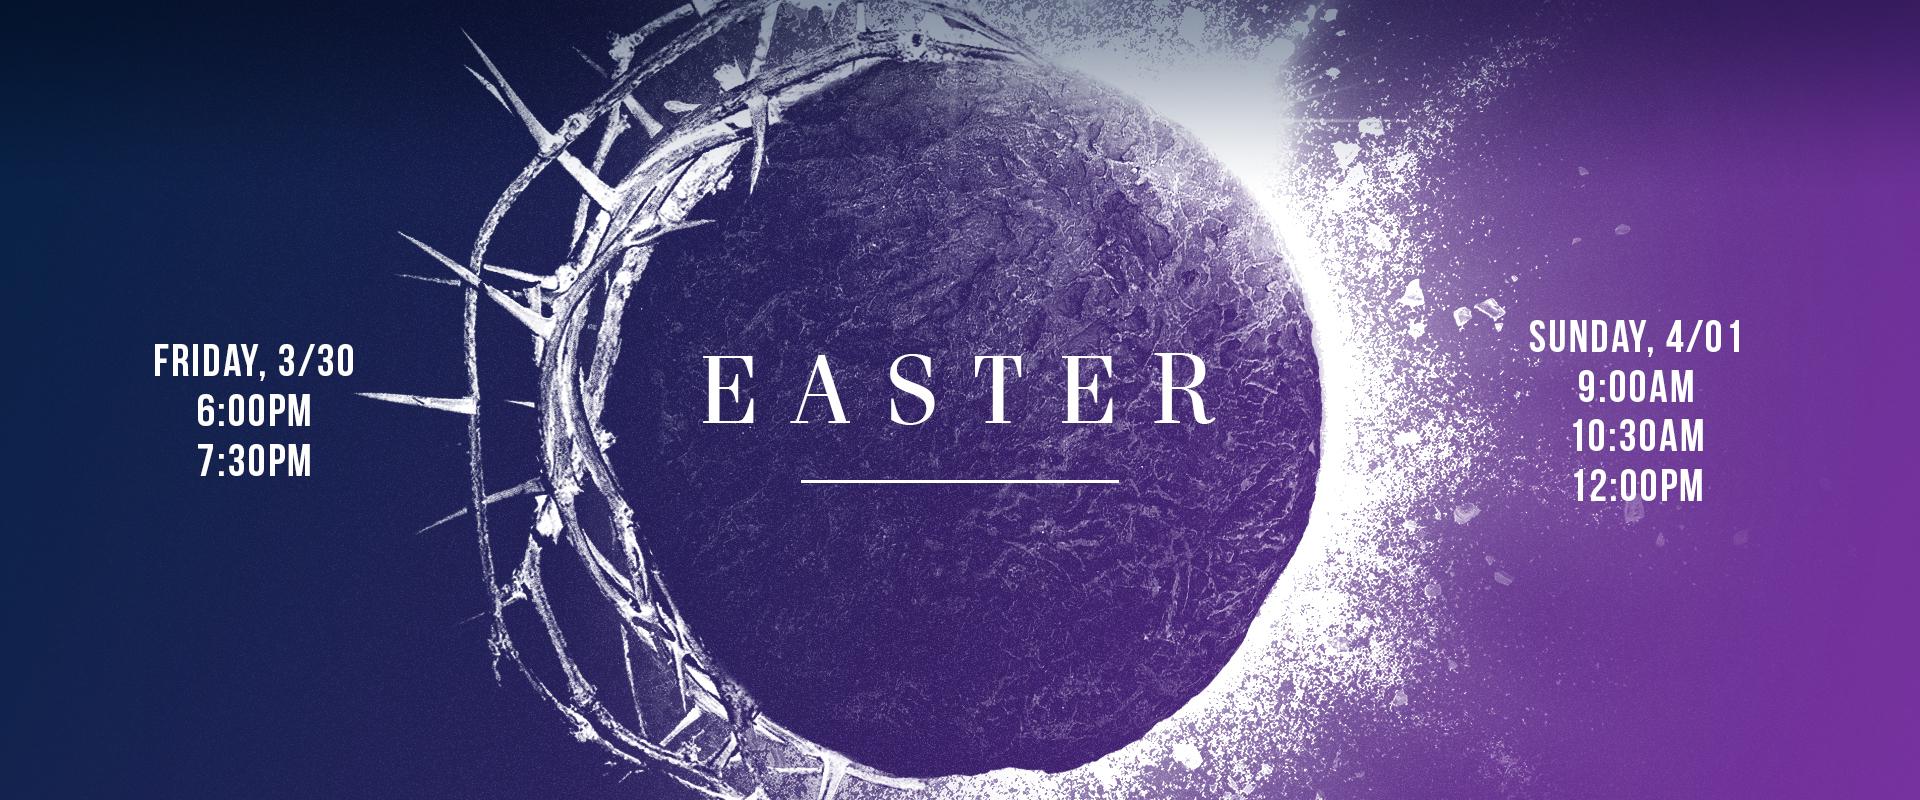 Easter 2018 - front page slide